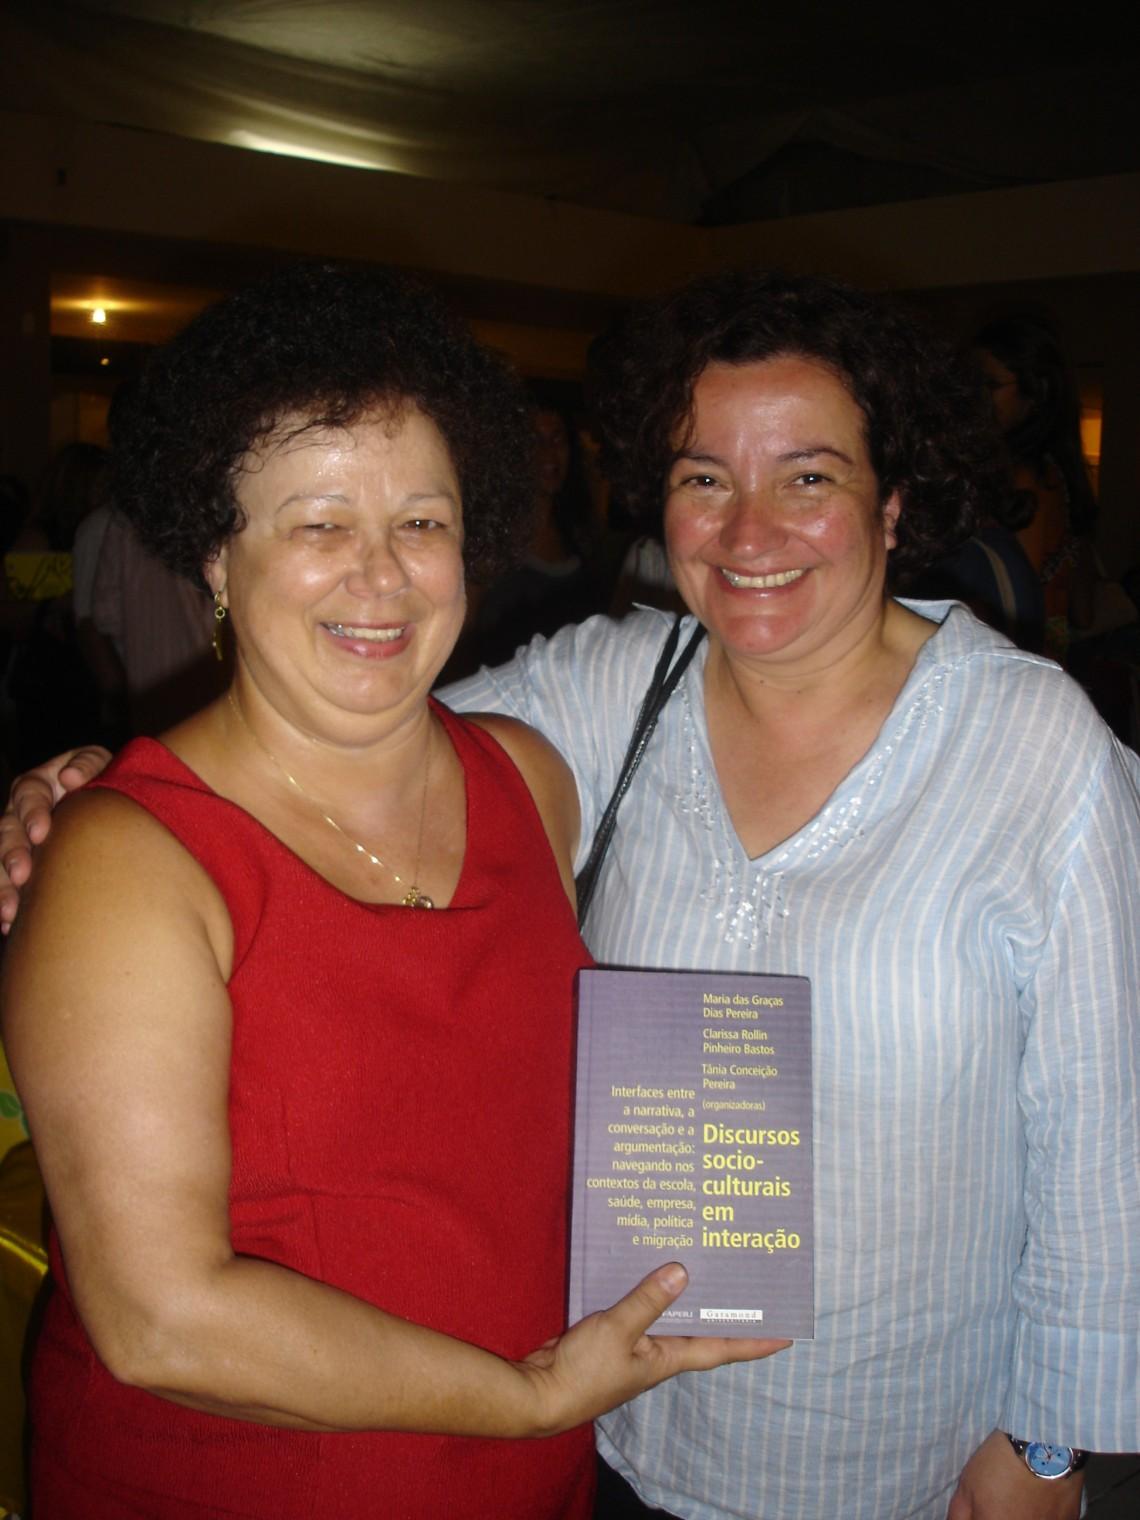 Profa. Graça e Profa. Margarita Correia (ILTEC, Lisboa)